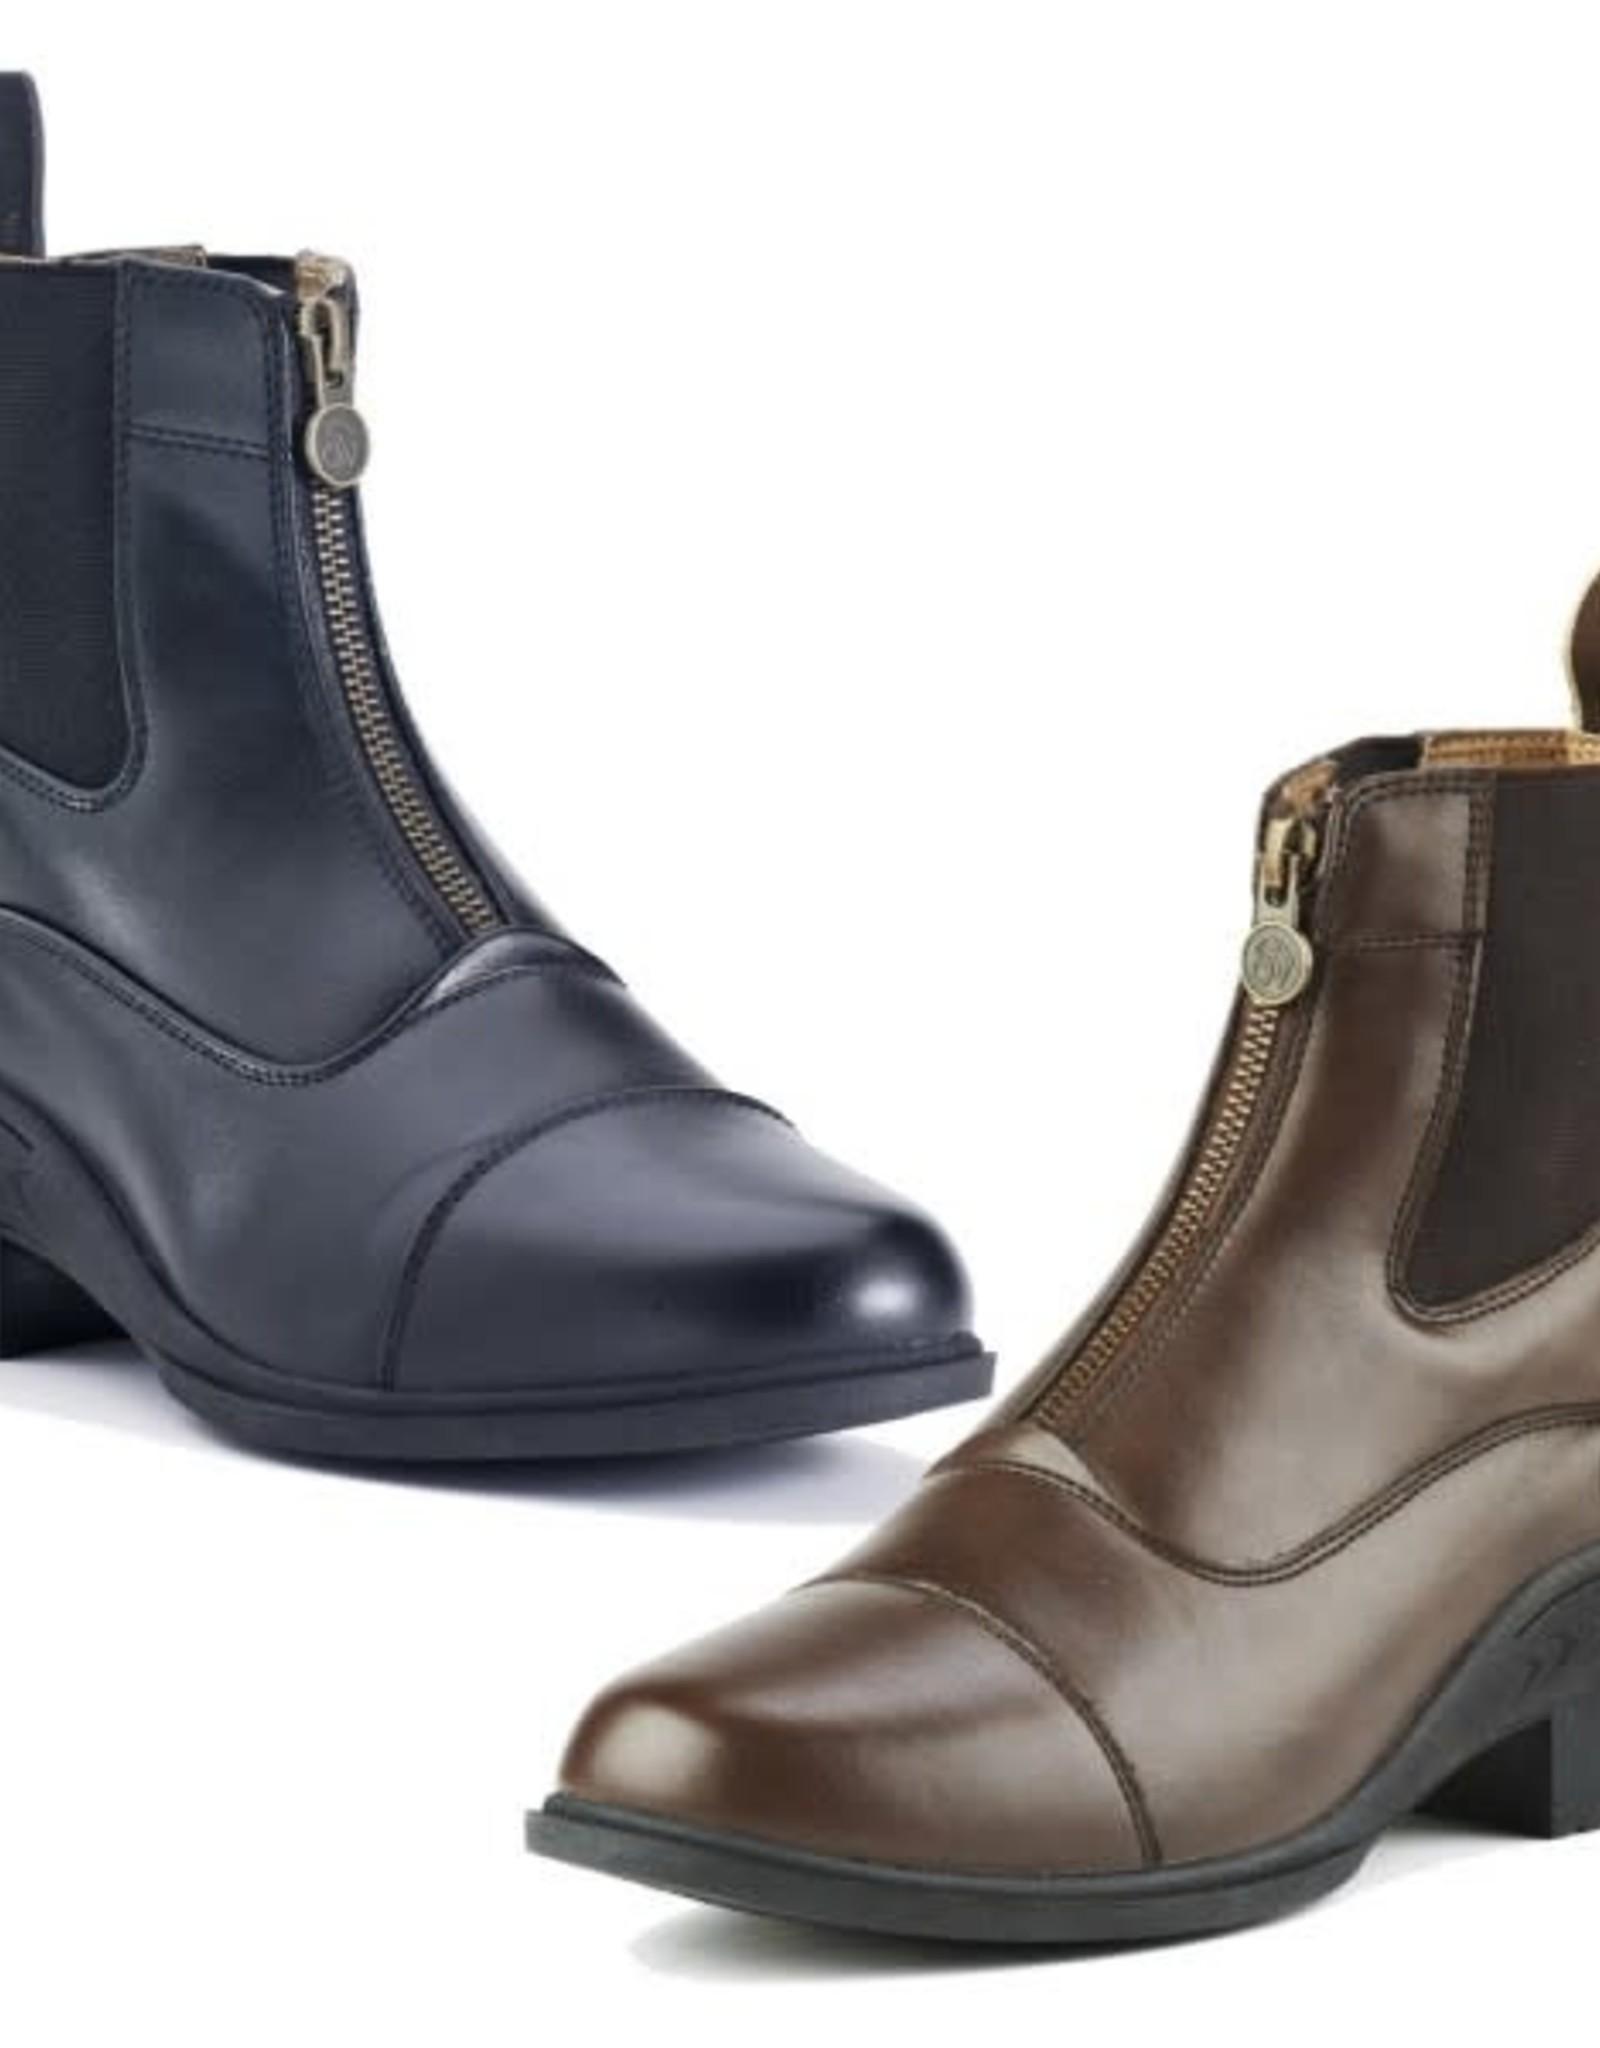 Ovation Quantum Ladies Paddock Boot Ovation